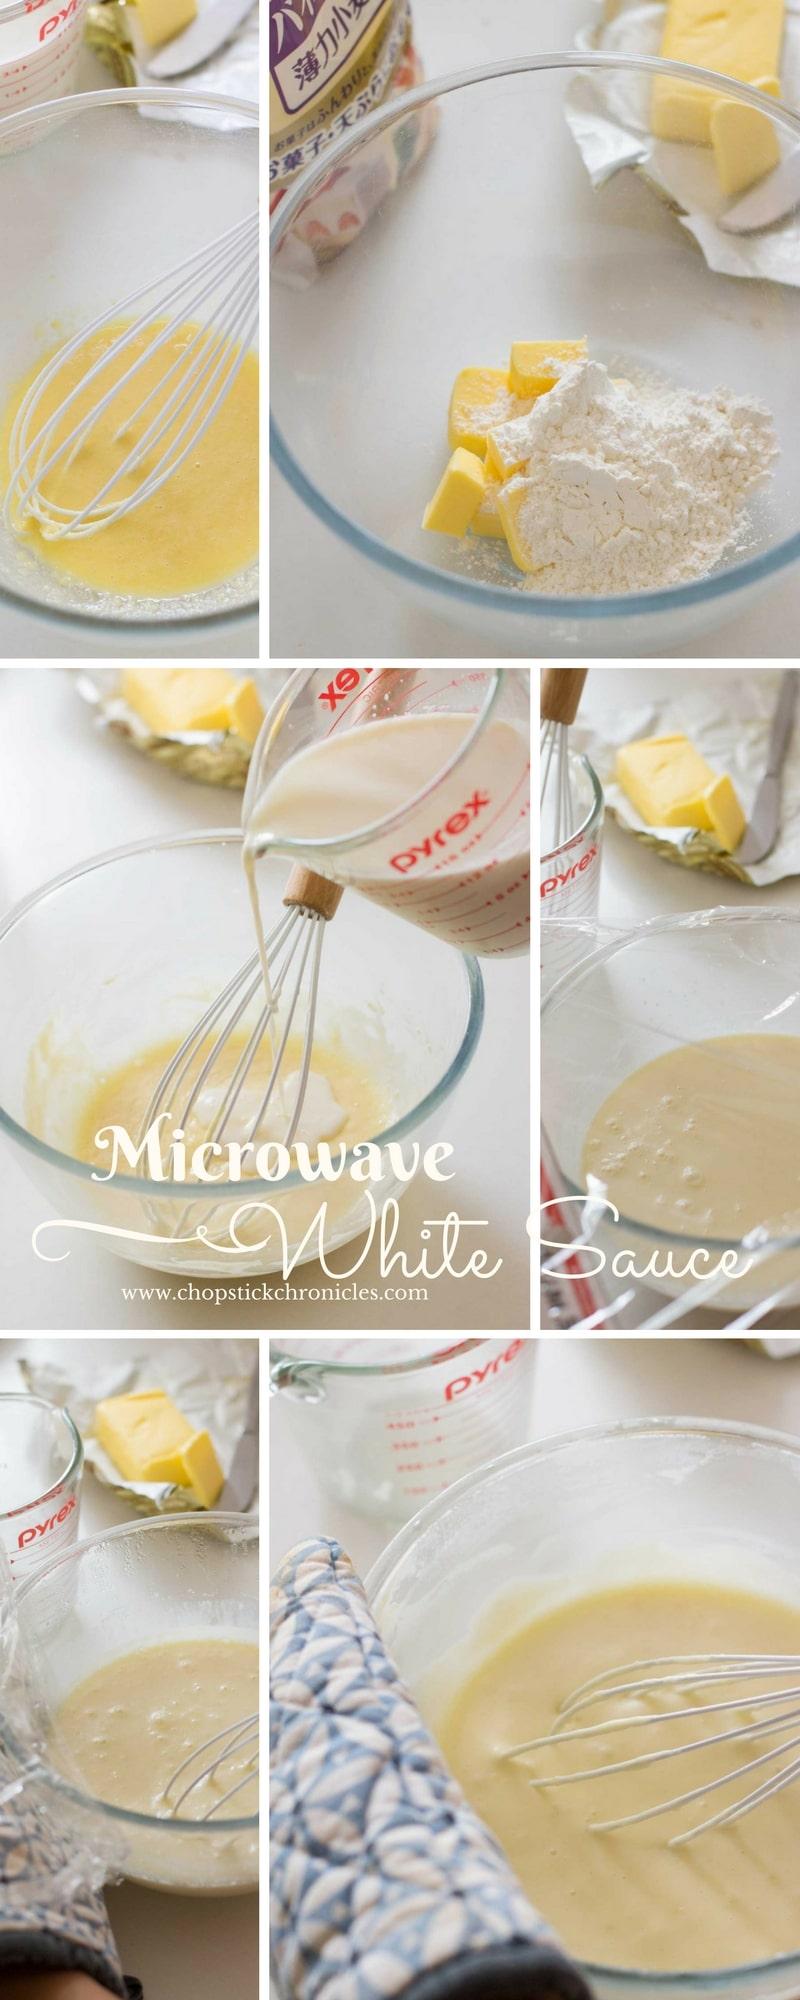 microwave white sauce